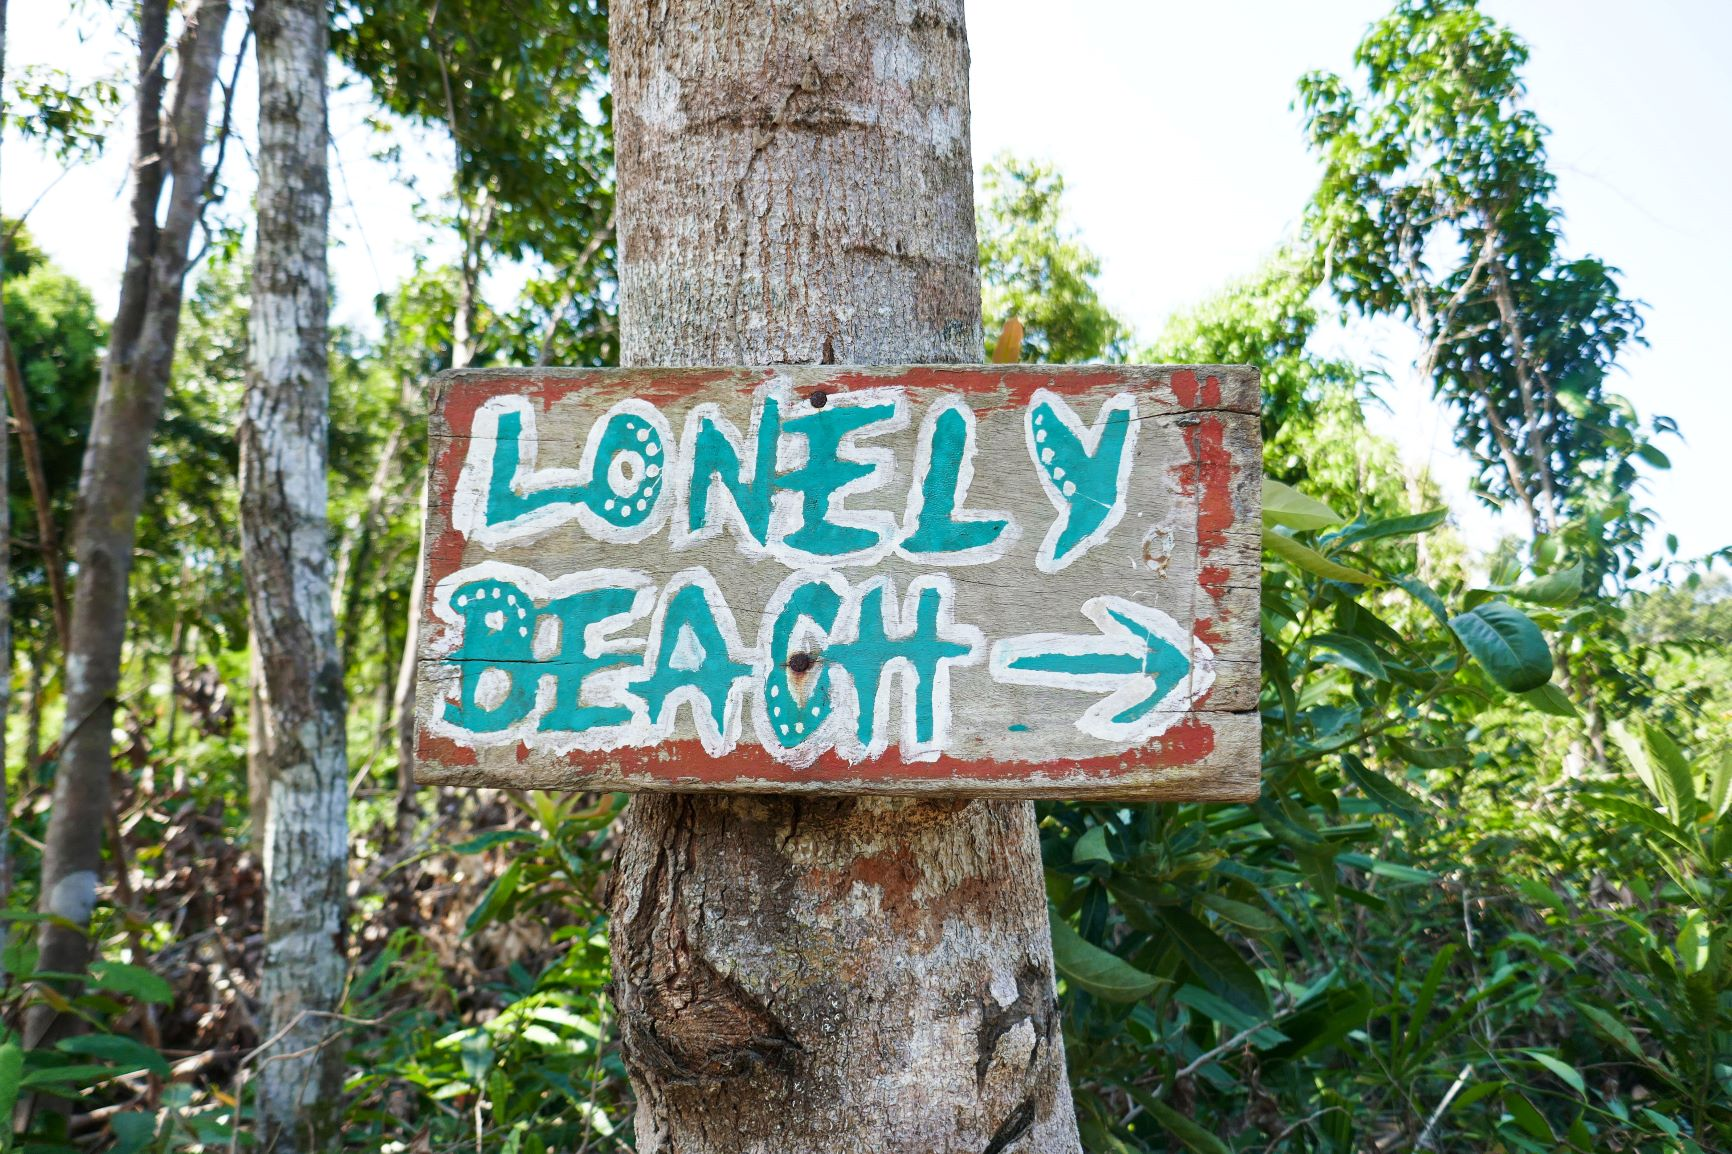 Bordje Lonely beach